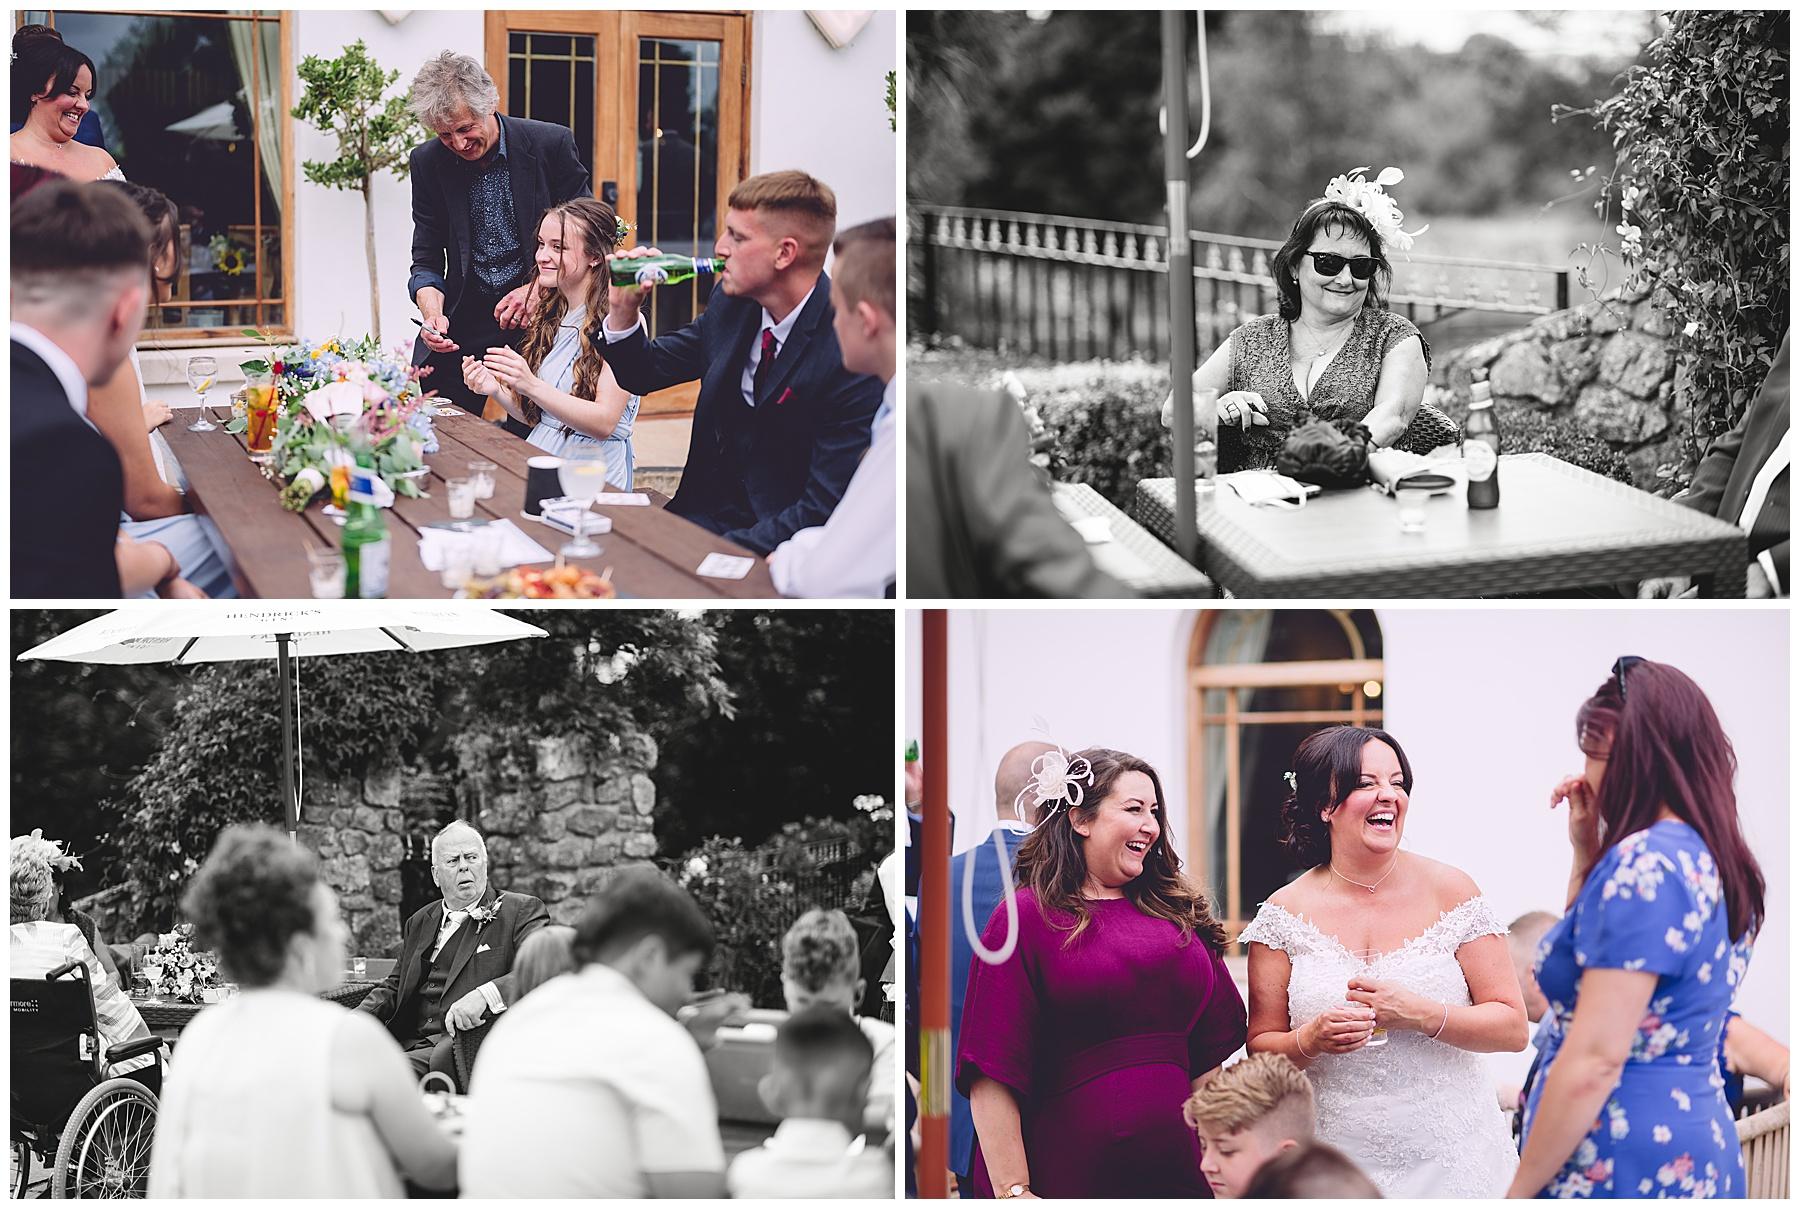 Wedding Guests at King Arthur Hotel